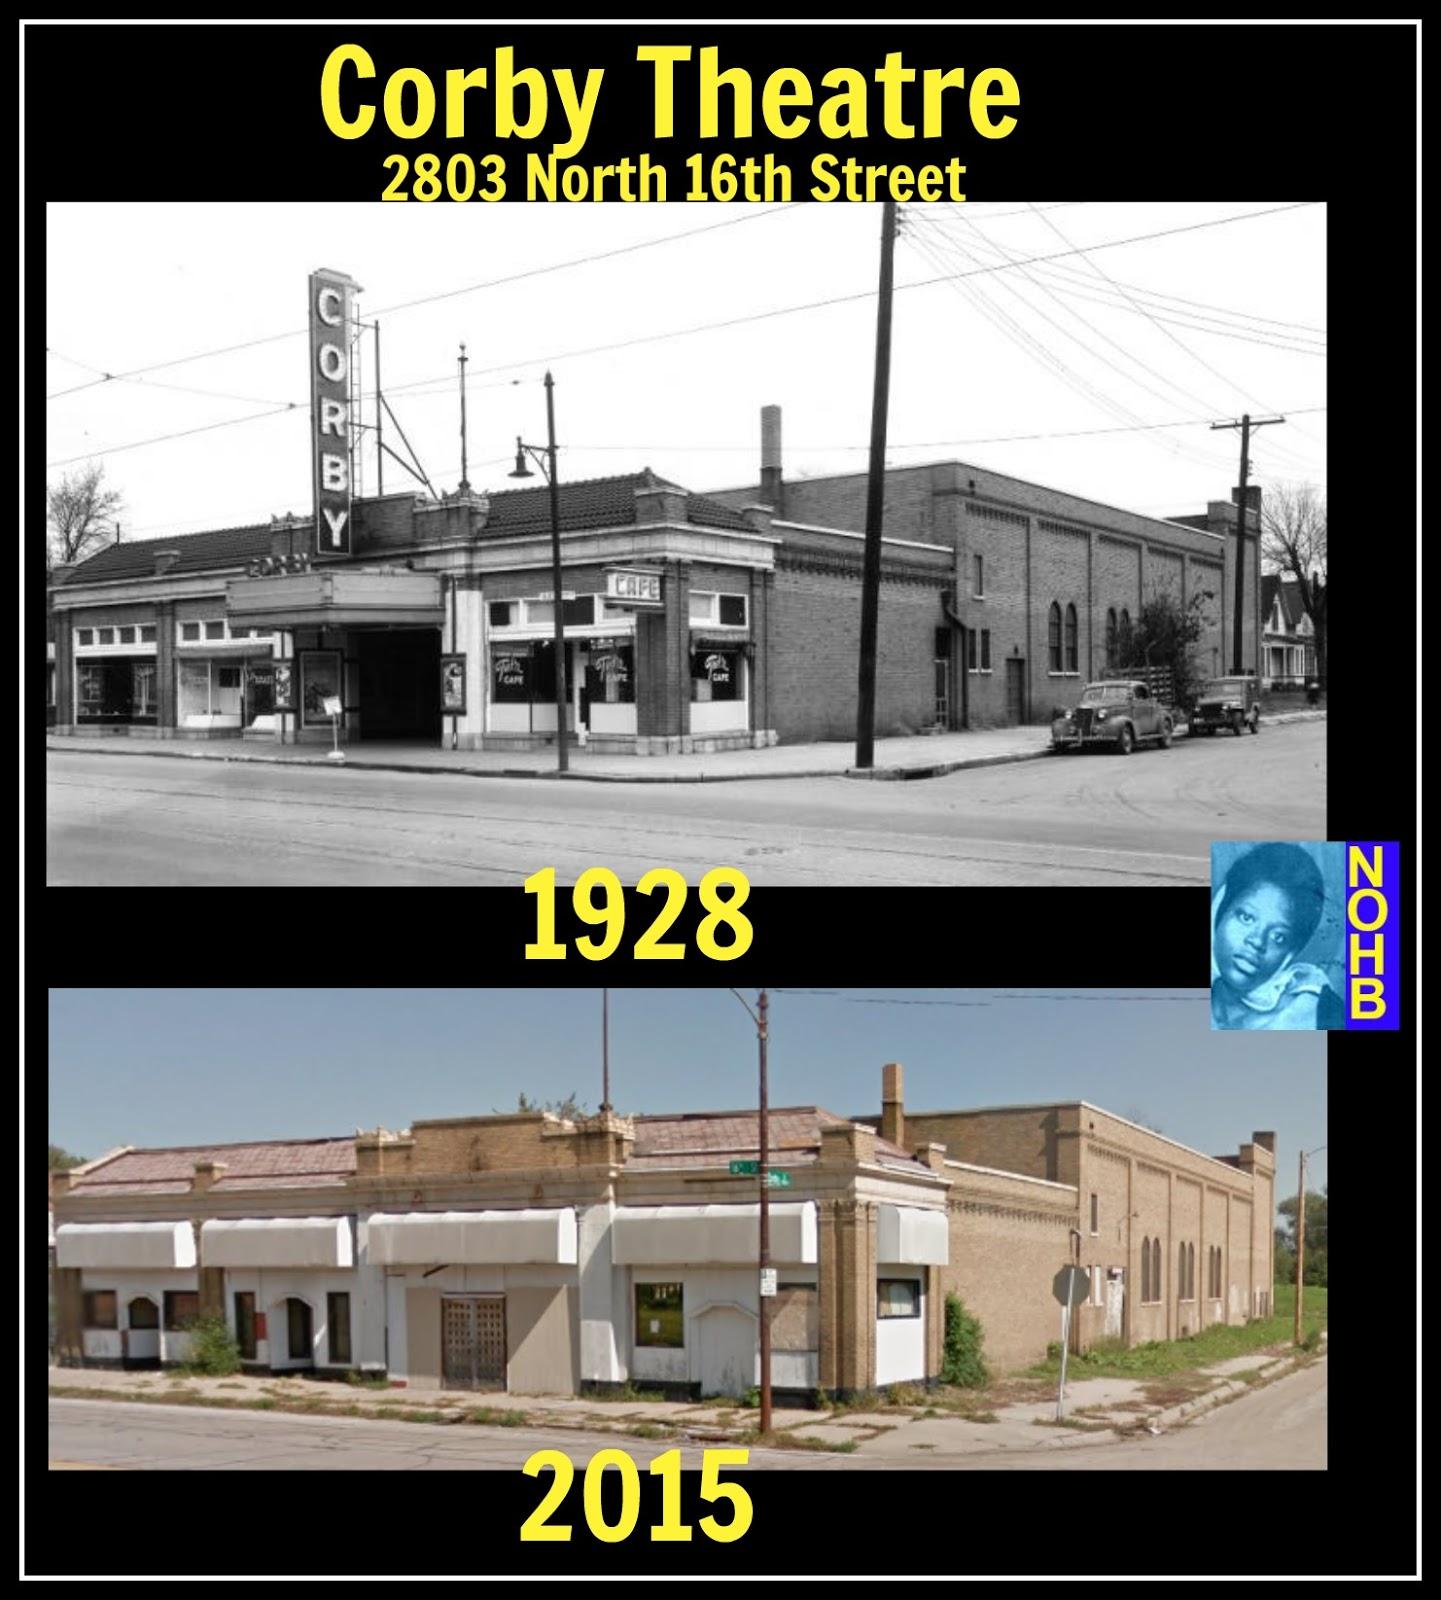 Corby Theater, 2803 North 16th Street, North Omaha, Nebraska